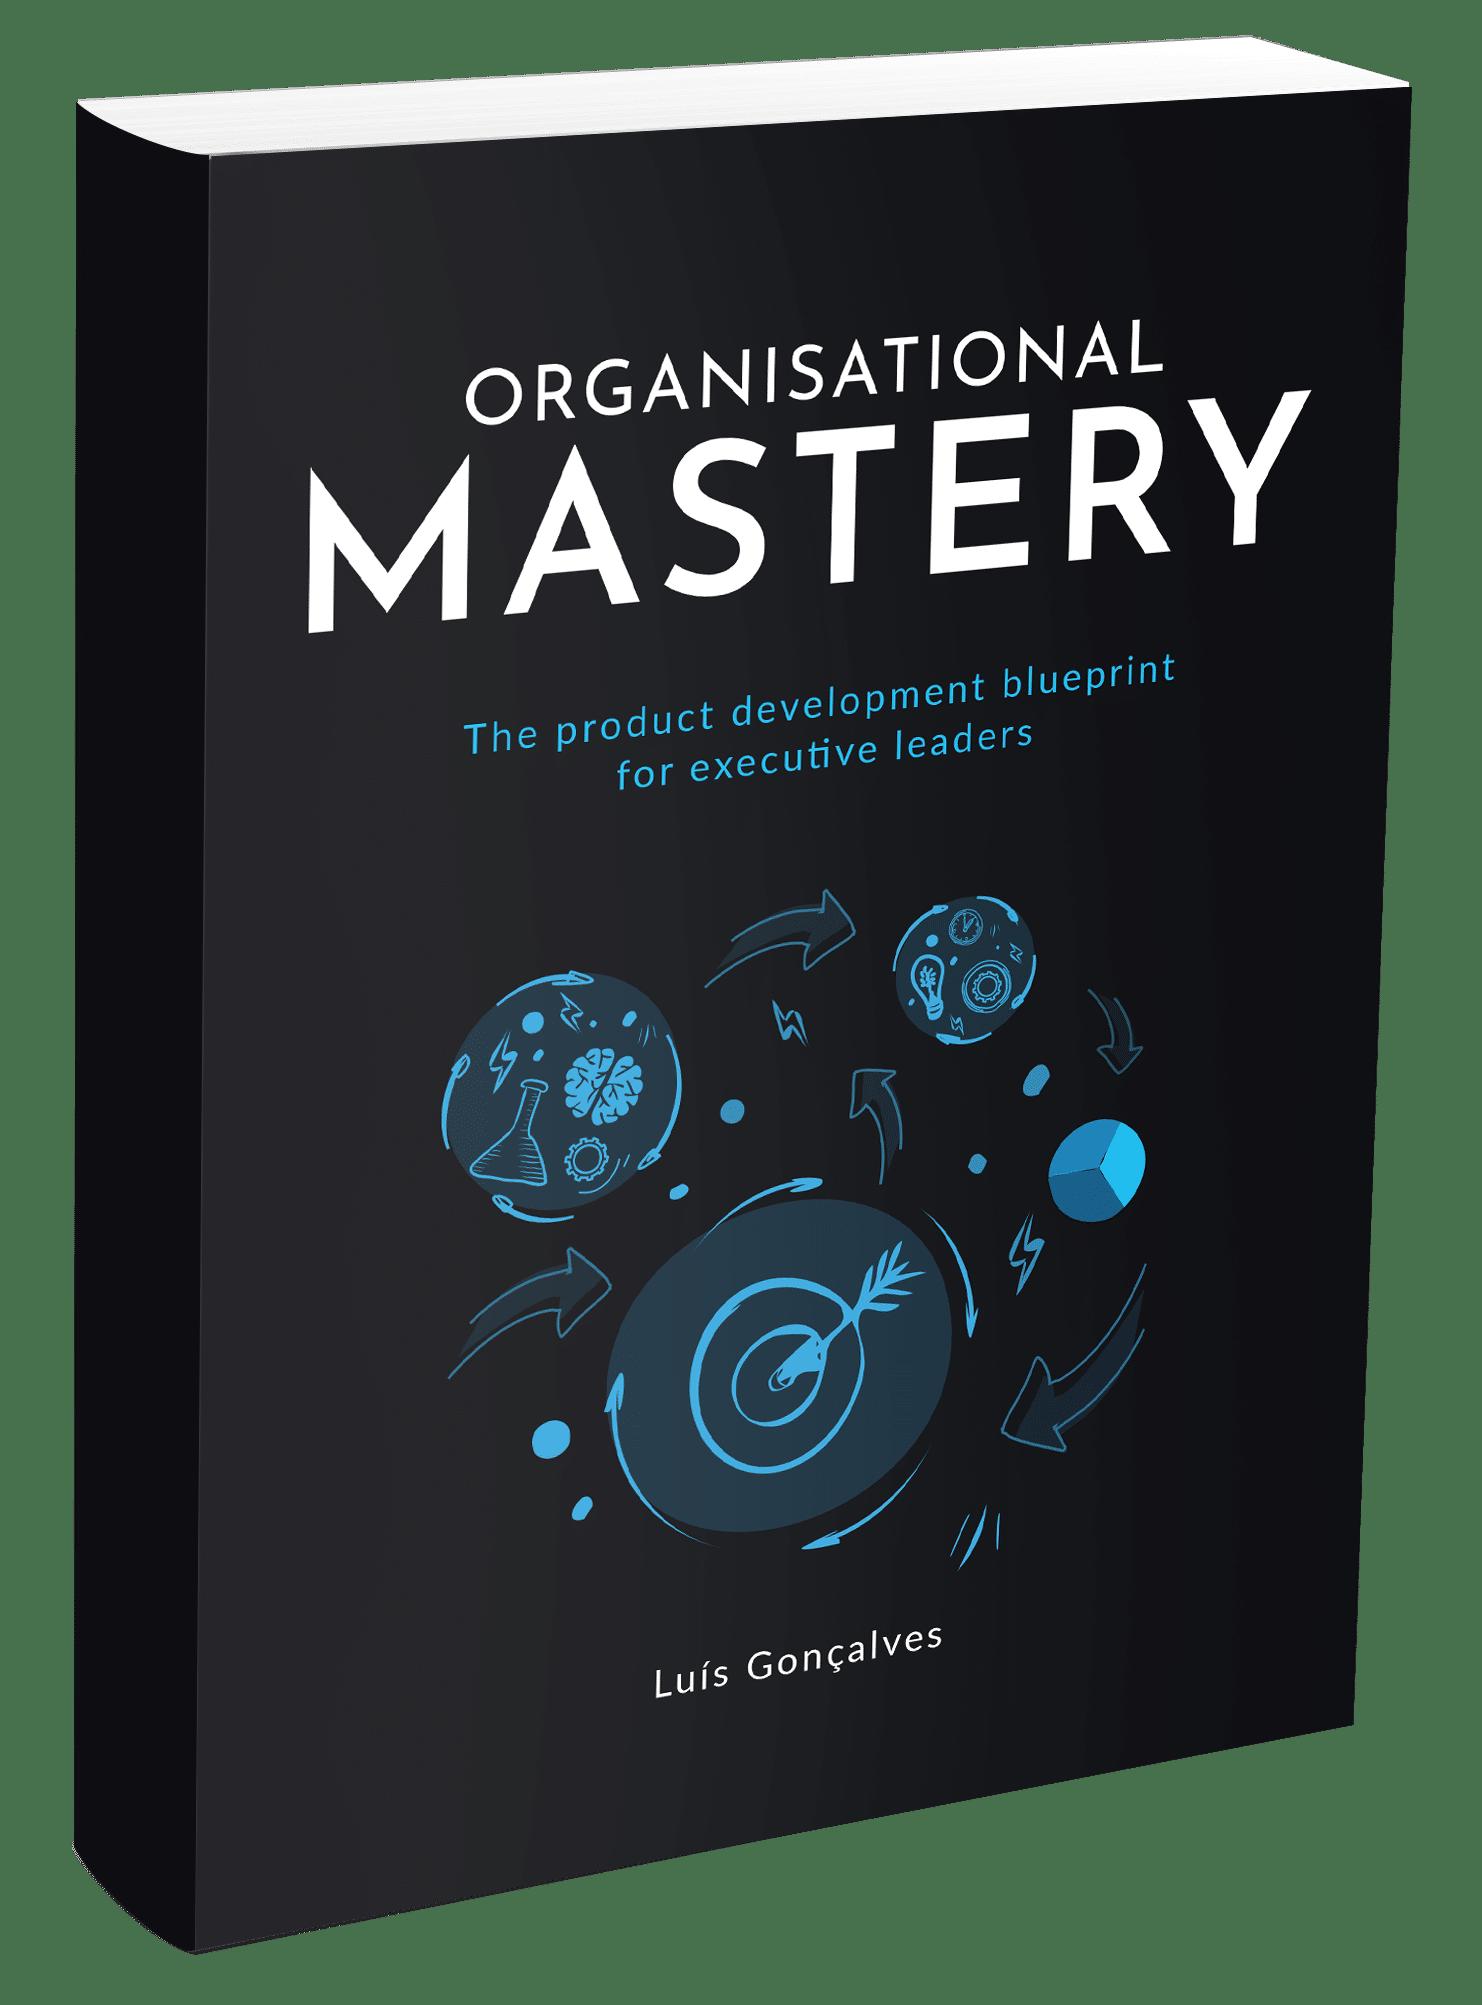 Organisational Mastery